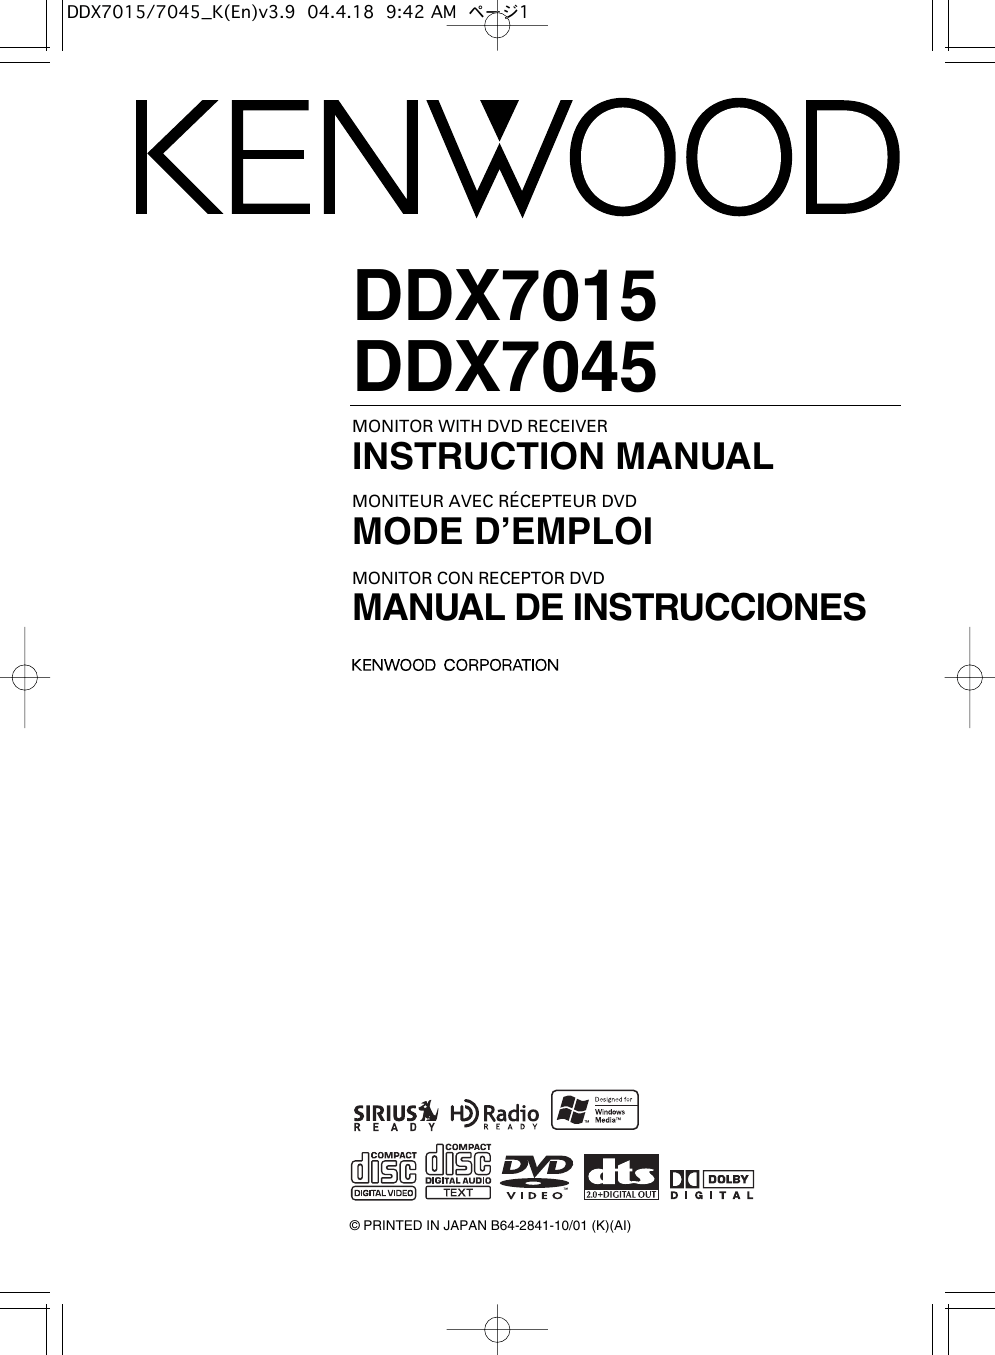 medium resolution of kenwood excelon ddx7015 wiring diagram